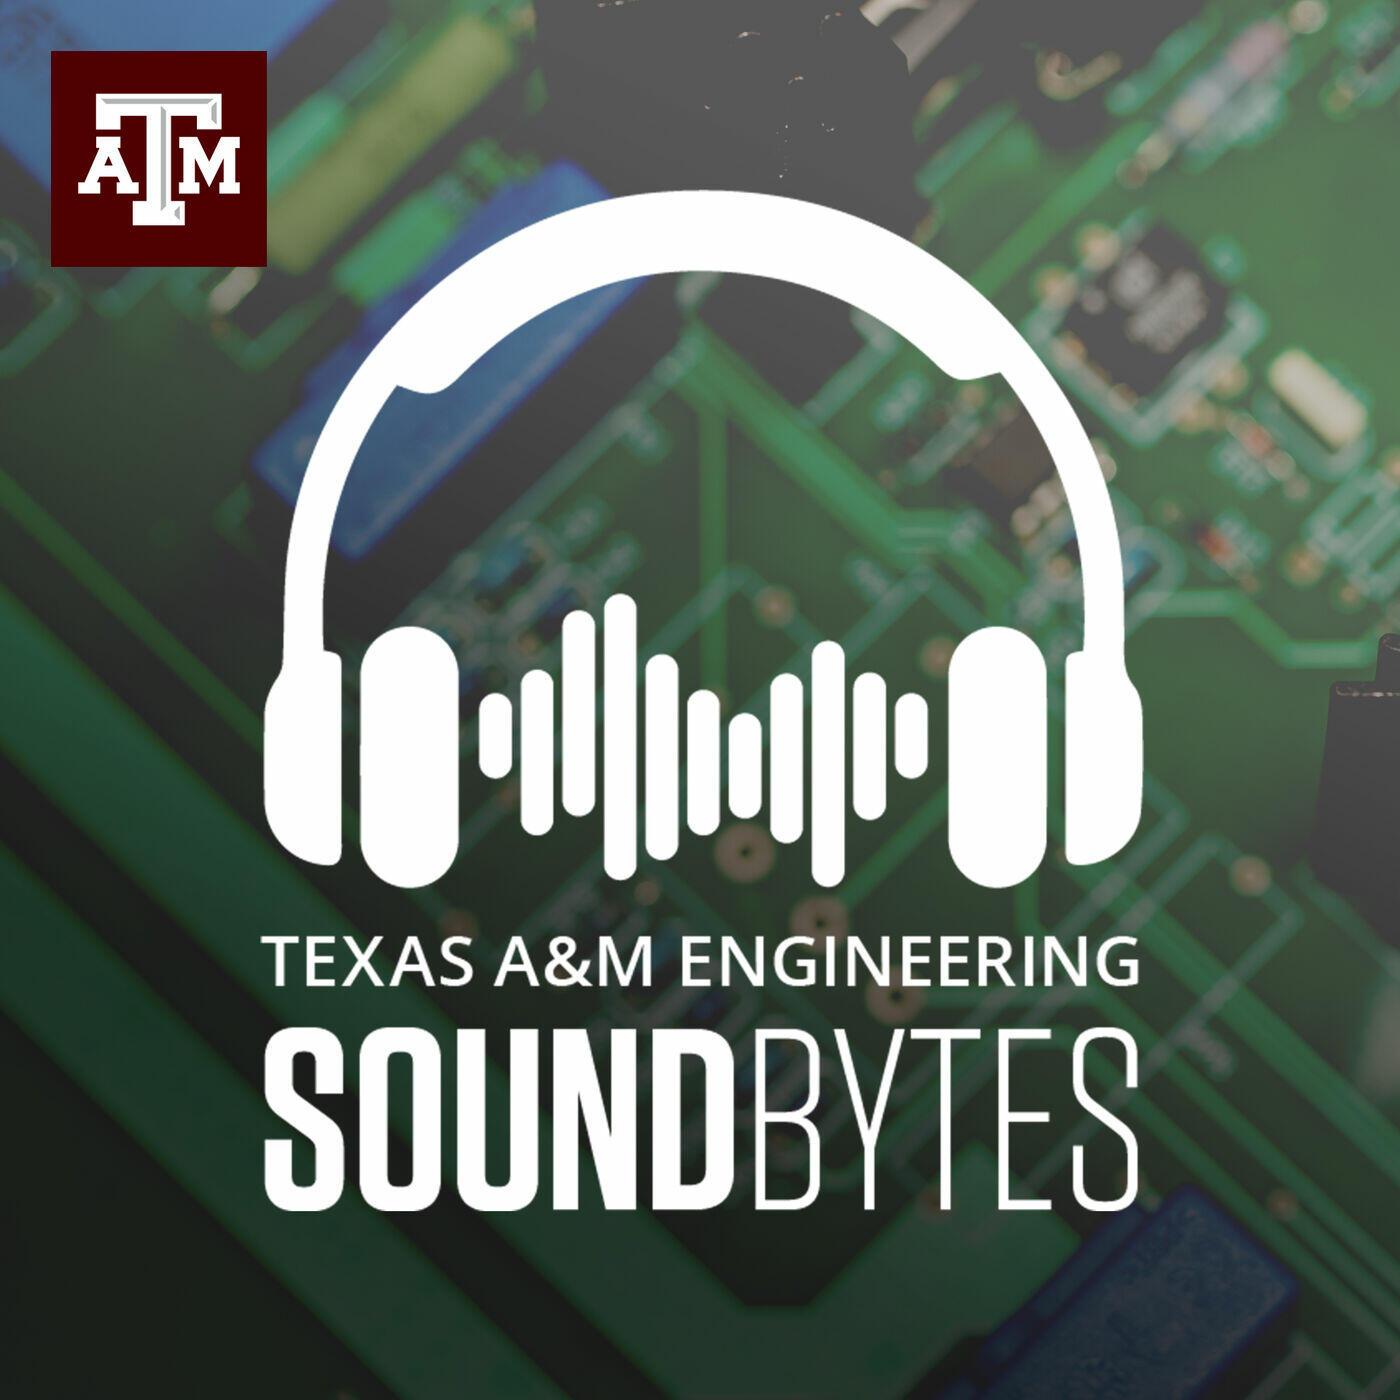 Texas A&M Engineering SoundBytes